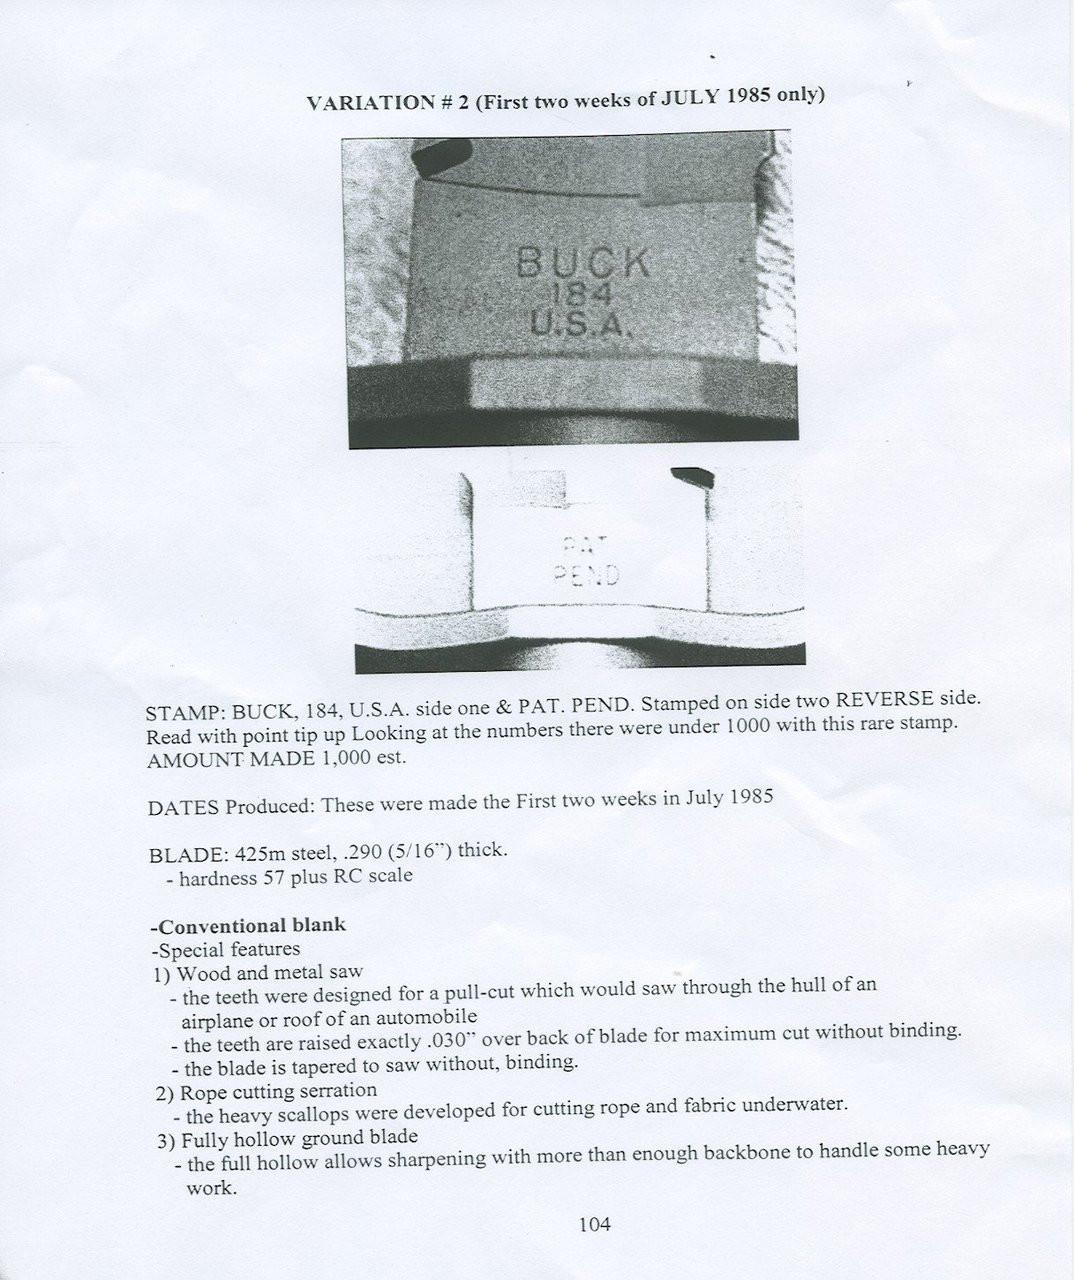 BUCK SURVIVAL KNIFE - M4339